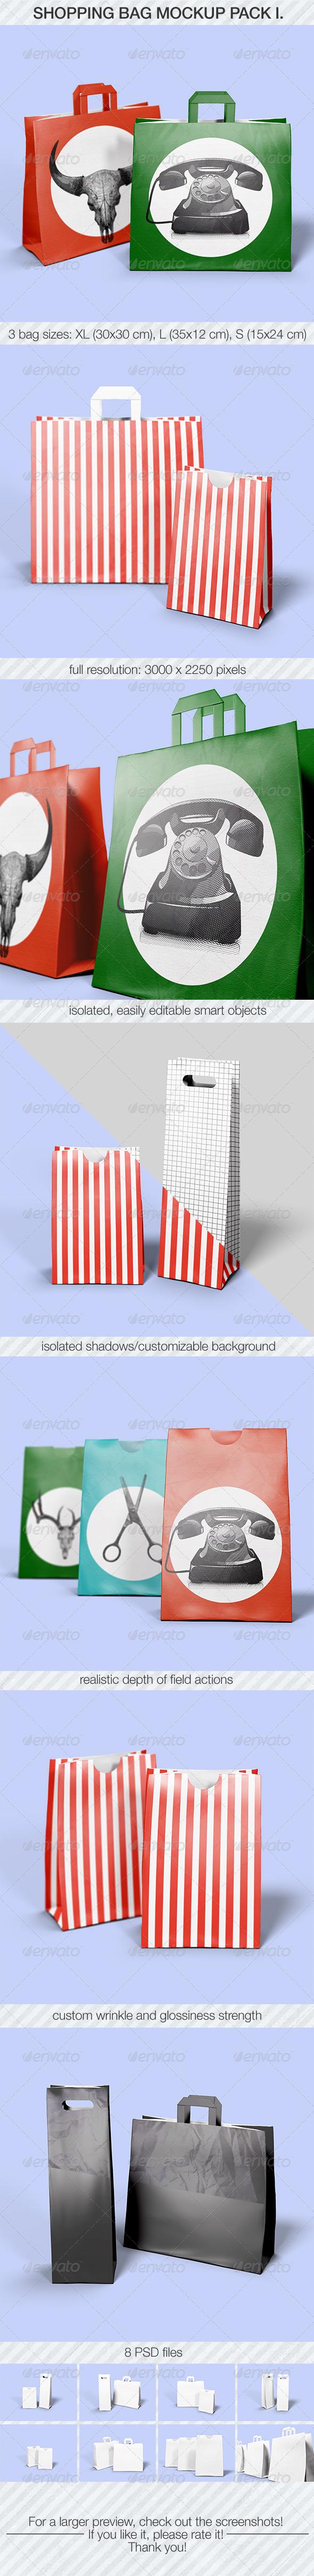 Shopping Bag Mockup Pack I. - Miscellaneous Product Mock-Ups